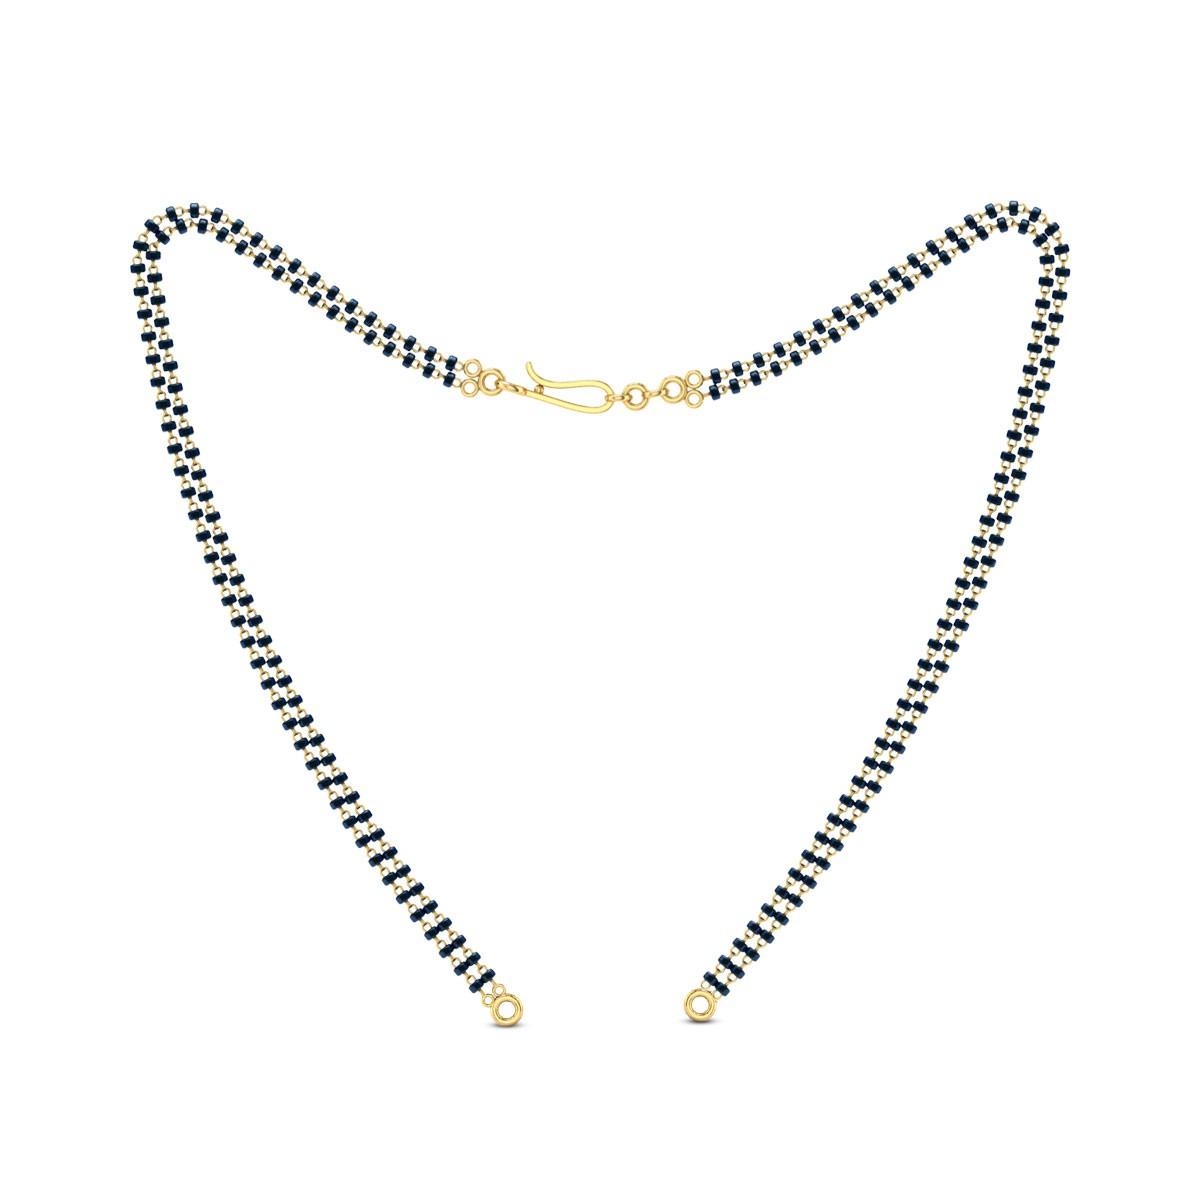 Mangalsutra chain 18 inch